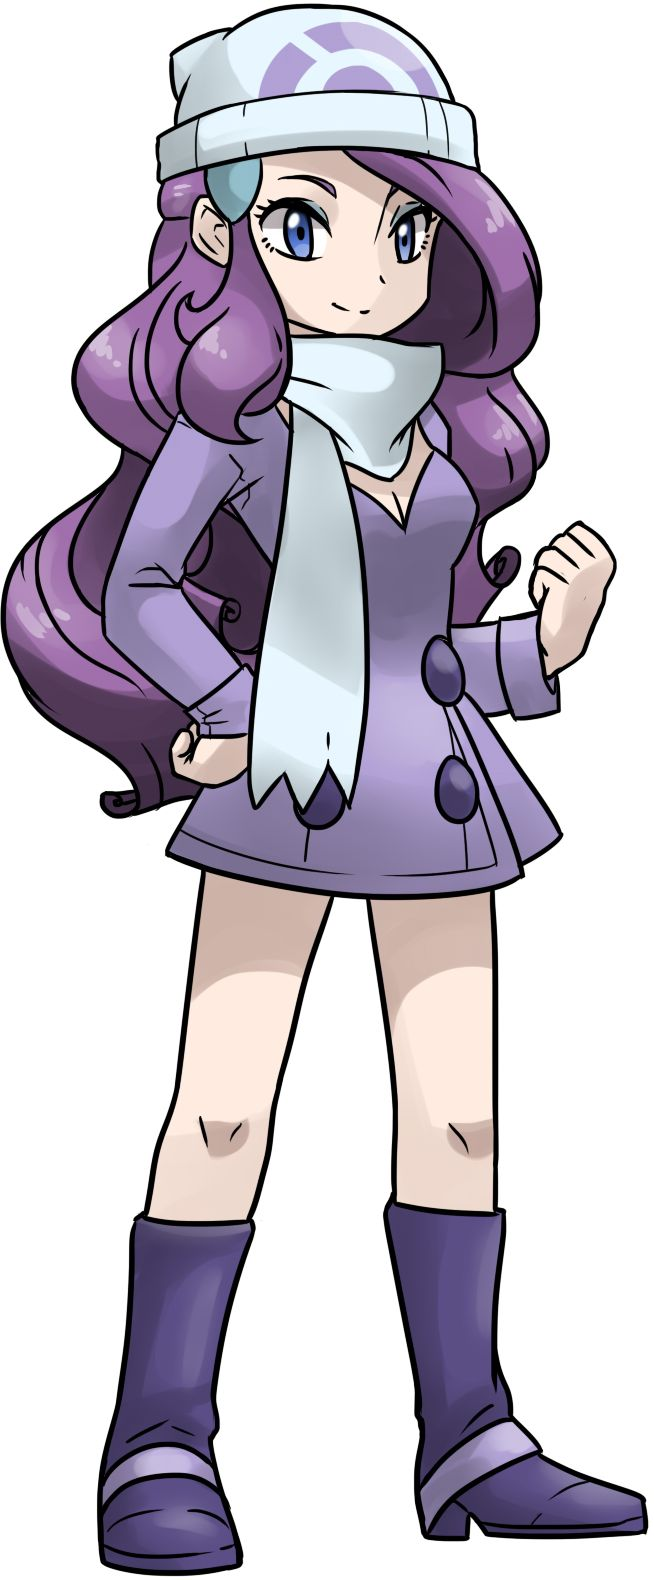 { Remmy Clyde ~ Fashionable ~ Generous ~ Beautiful ~ Popular ~ Smart ~ Great at Sewing ~ Brave ~ Pokèmon Stylist (ポケモンスタイリスト) ~ Sketches Designs ~ Crush: Rin ~   (Remī kuraido 〜 oshare 〜 kandaina 〜 utsukushī 〜 mishin de ninki 〜 sumāto 〜 gurēto 〜 bureibu 〜 pokemonsutairisuto (pokemonsutairisuto) wa 〜 suketchi ga dezain 〜 kurasshu: Rin 〜) (JAPANESE (MIGHT NOT BE ACCURATE SORRY!)